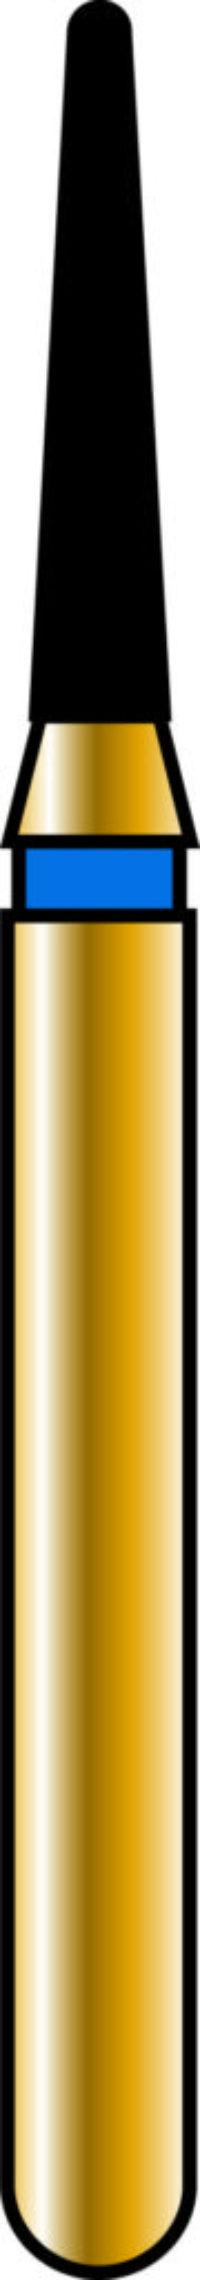 Round End Taper 12-6mm Gold Diamond Bur